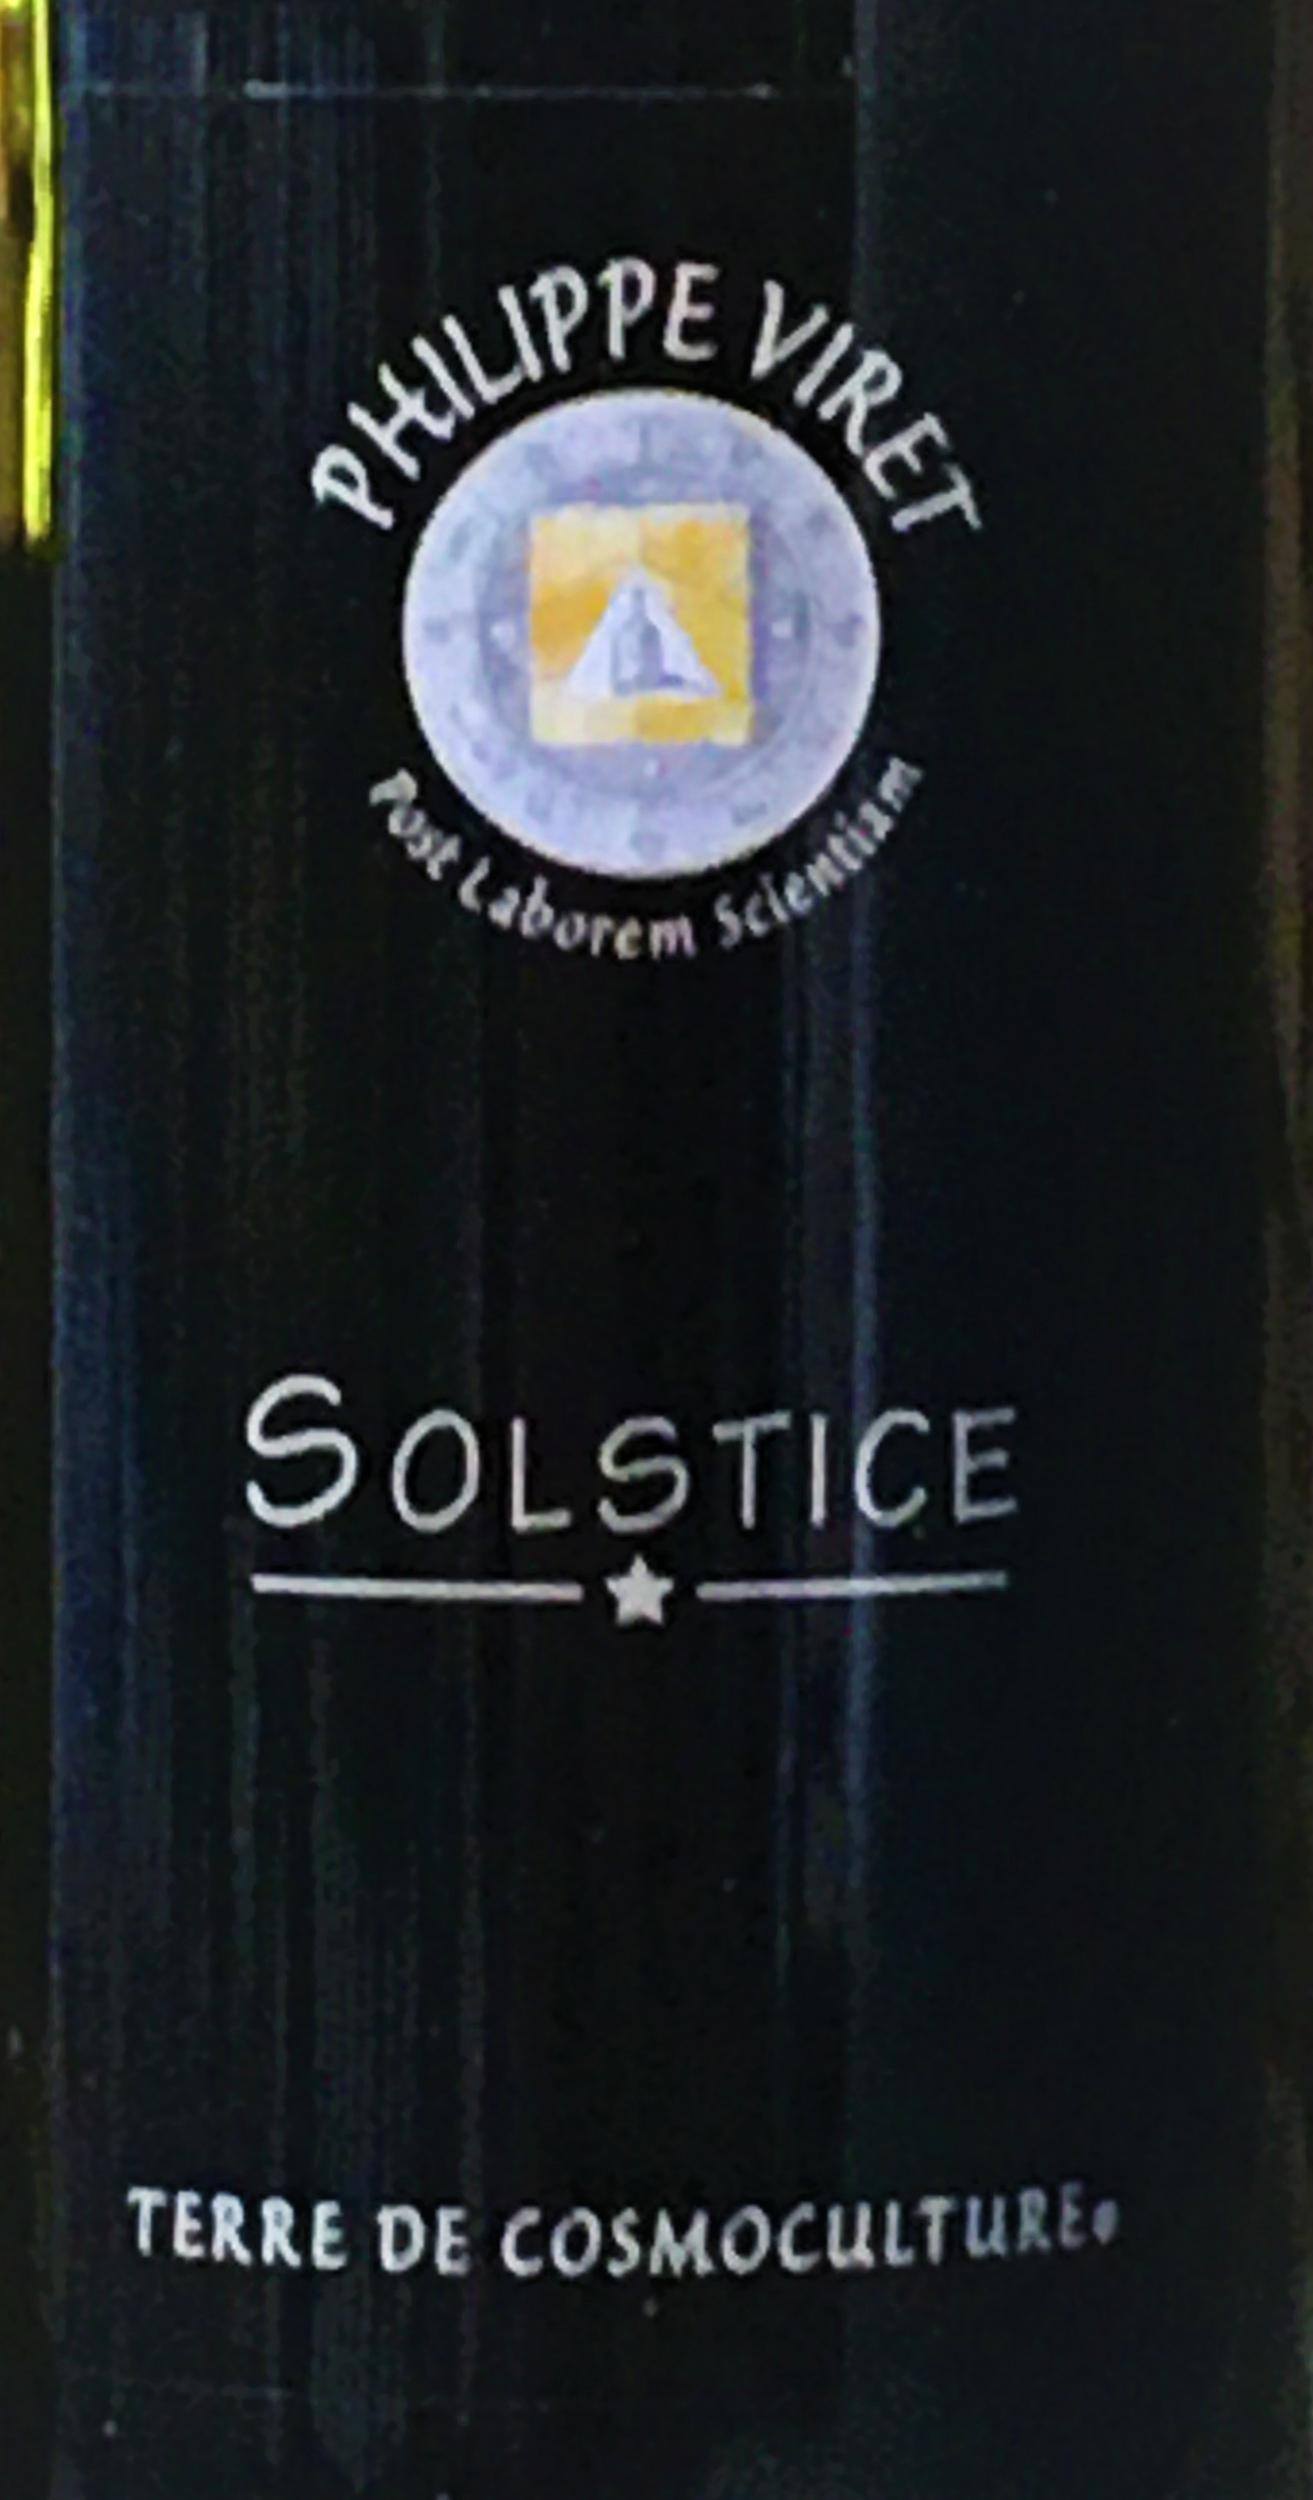 Solstice Rouge